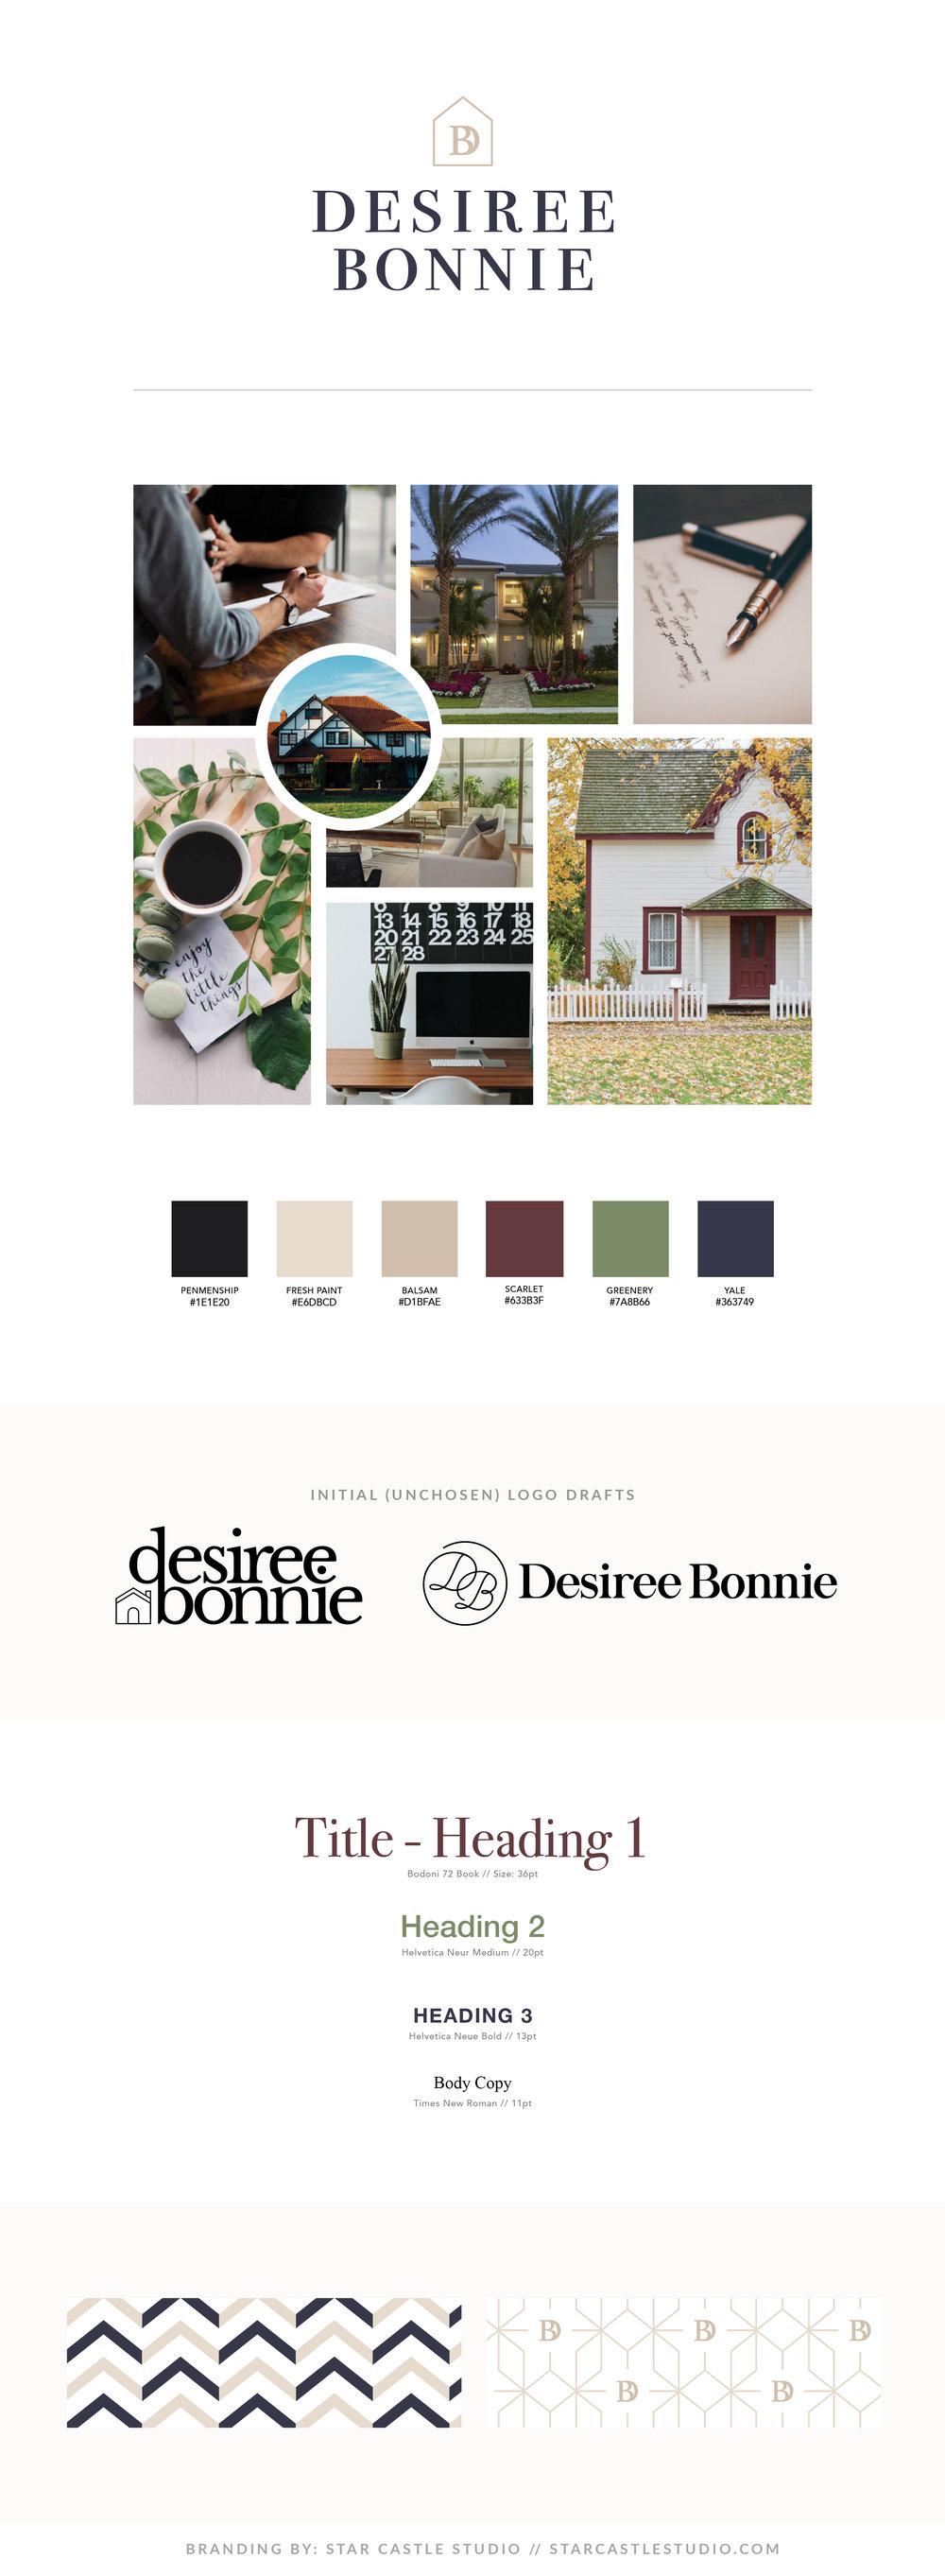 desiree_bonnie_realtor_branding